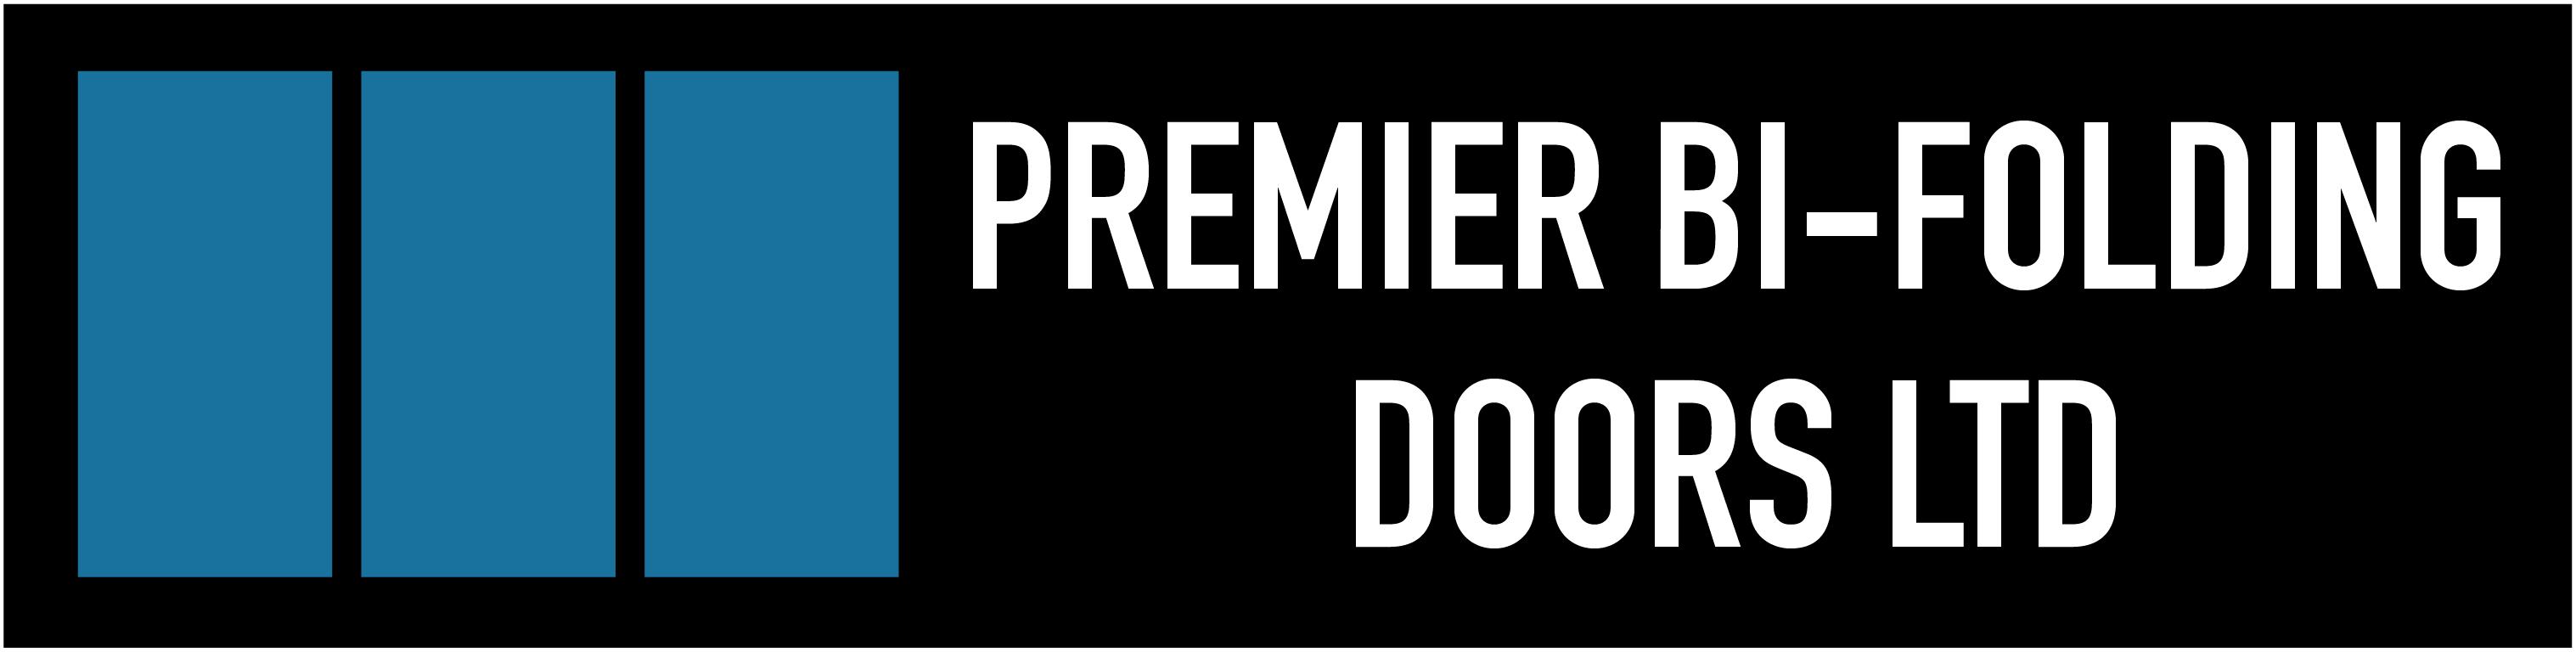 Premier Bi-Folding Doors LTD